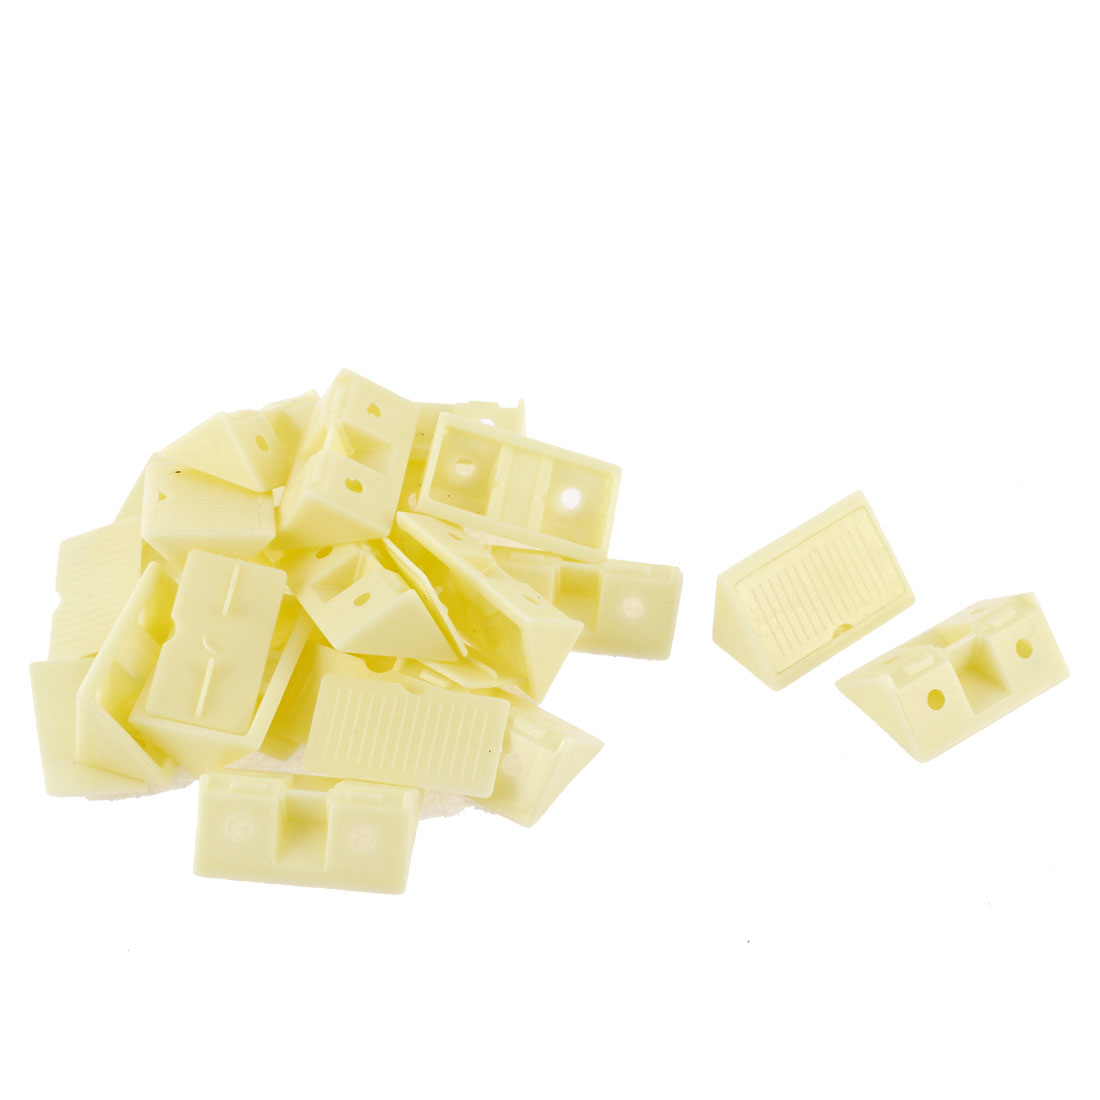 Furniture Shelf Cabinet Plastic 90 Degree Angle Brackets Yellow 15pcs